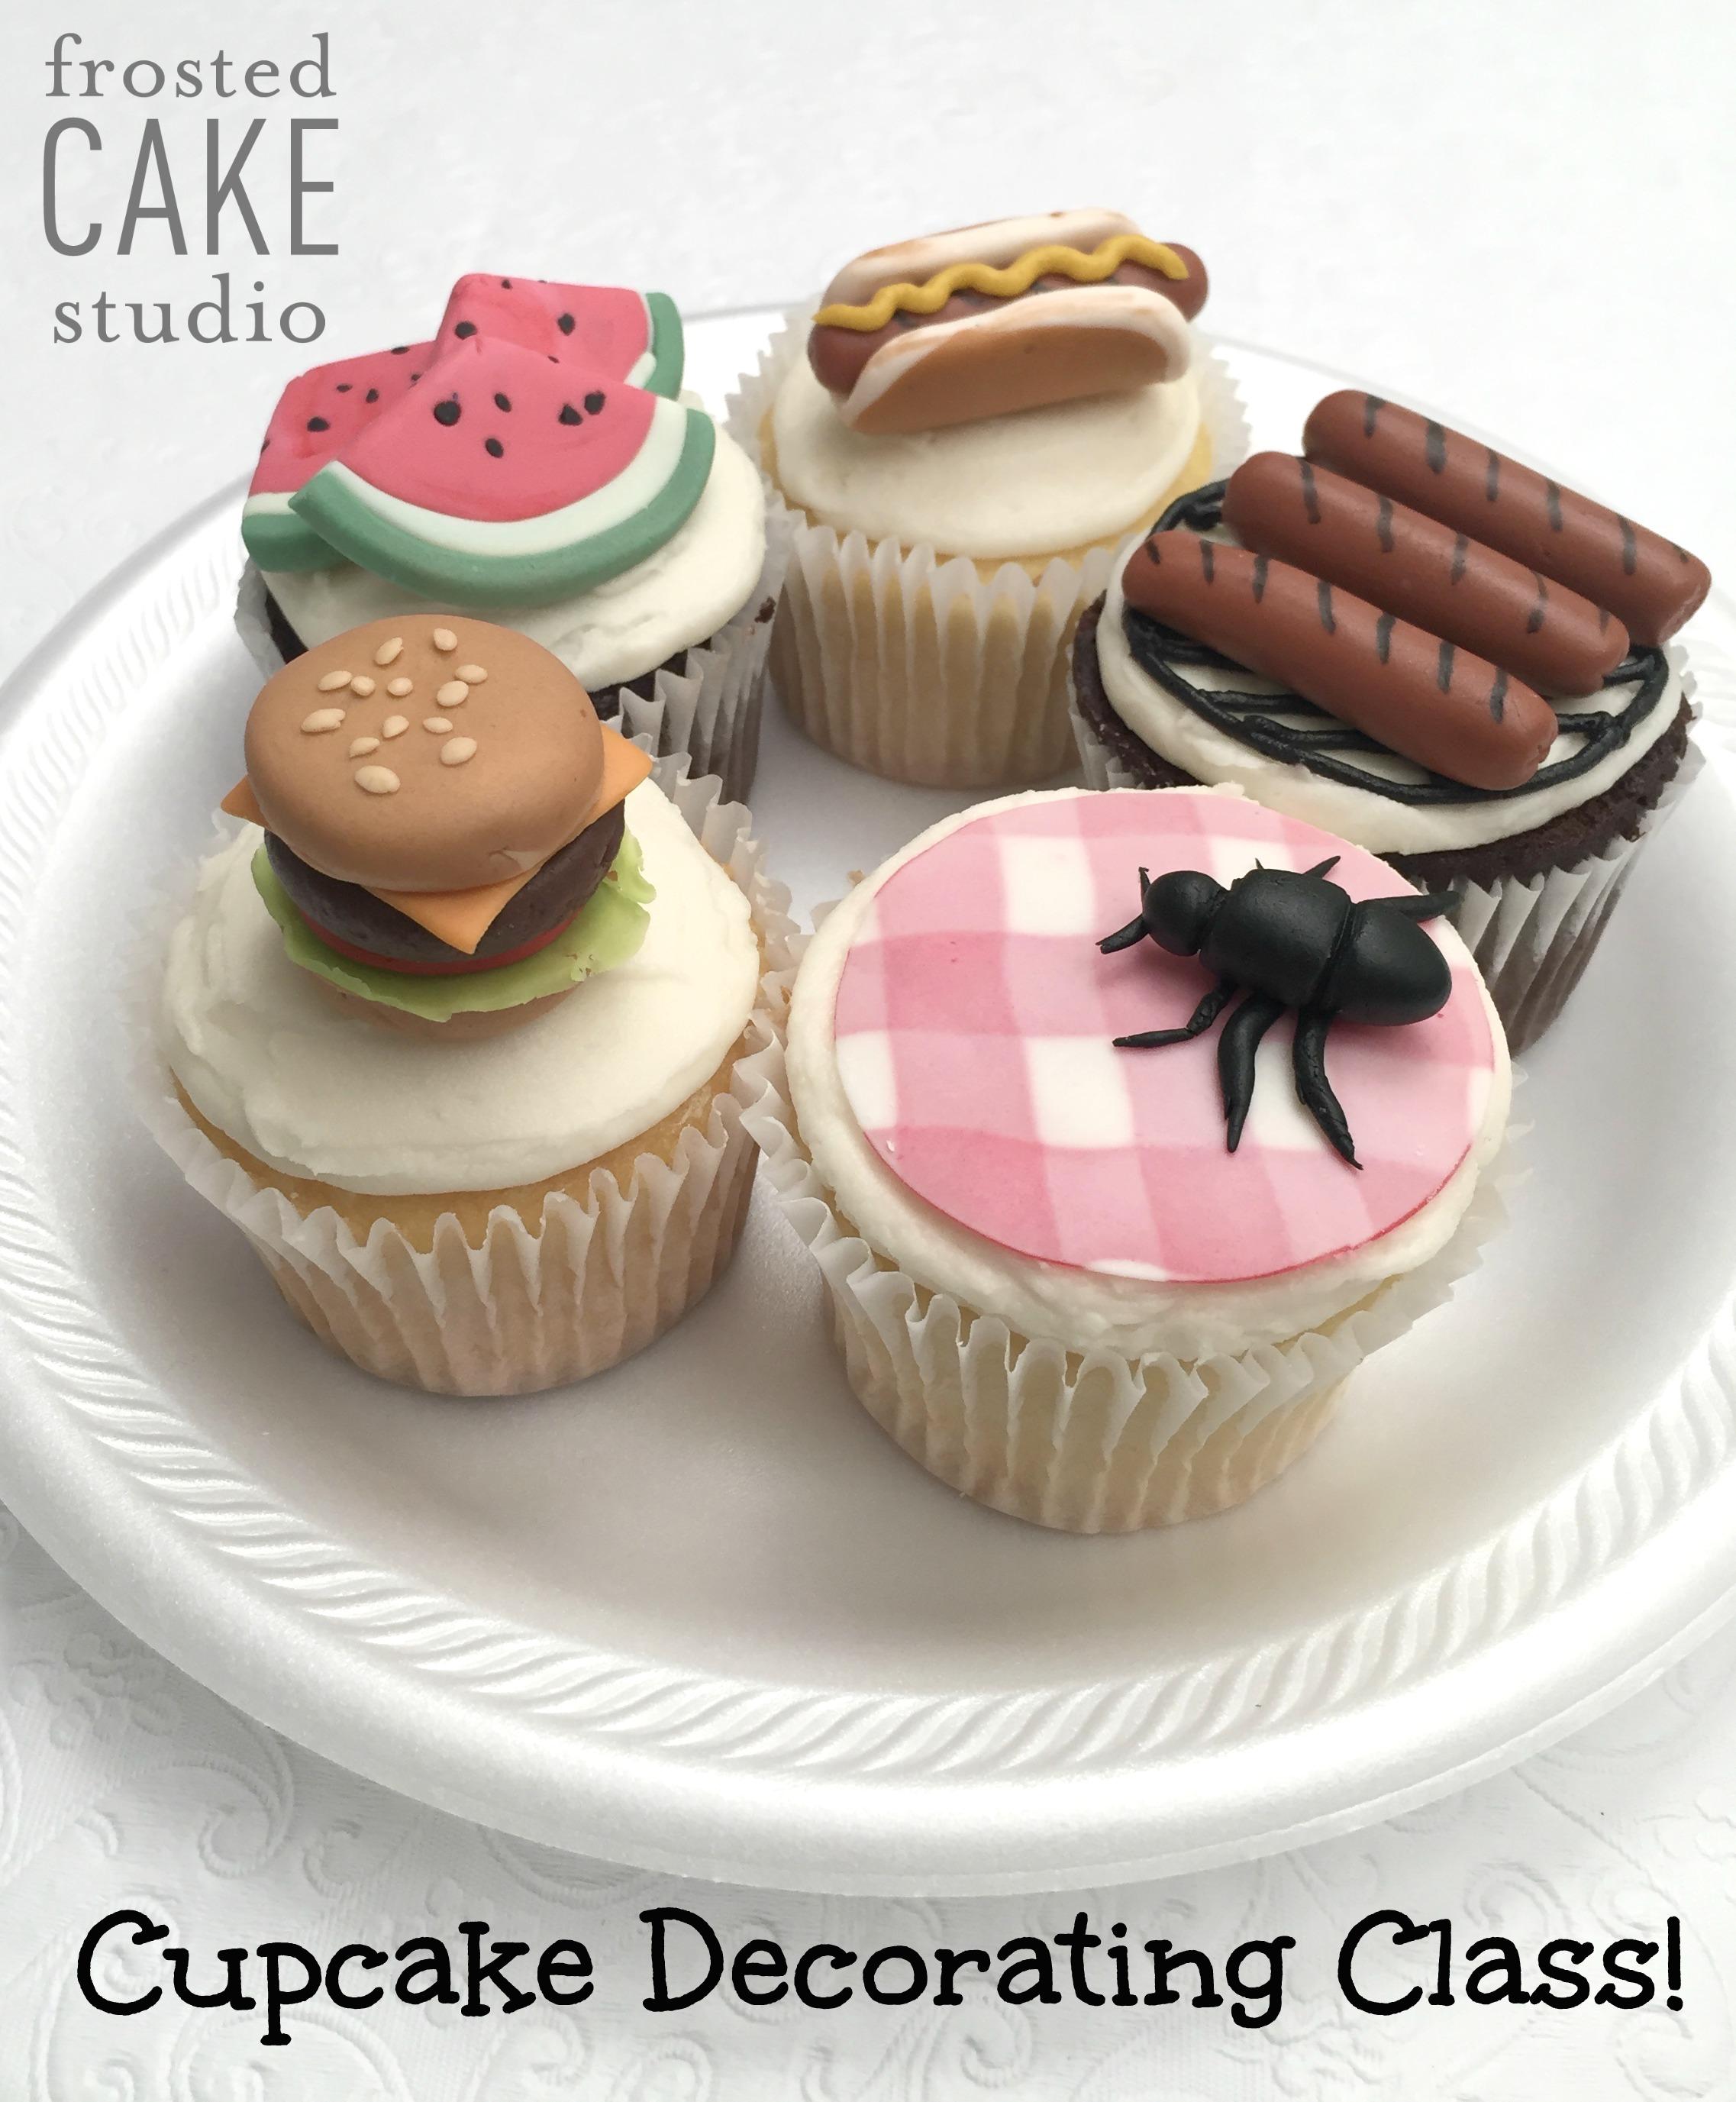 FrostedCakeStudioBBQCucpcakes